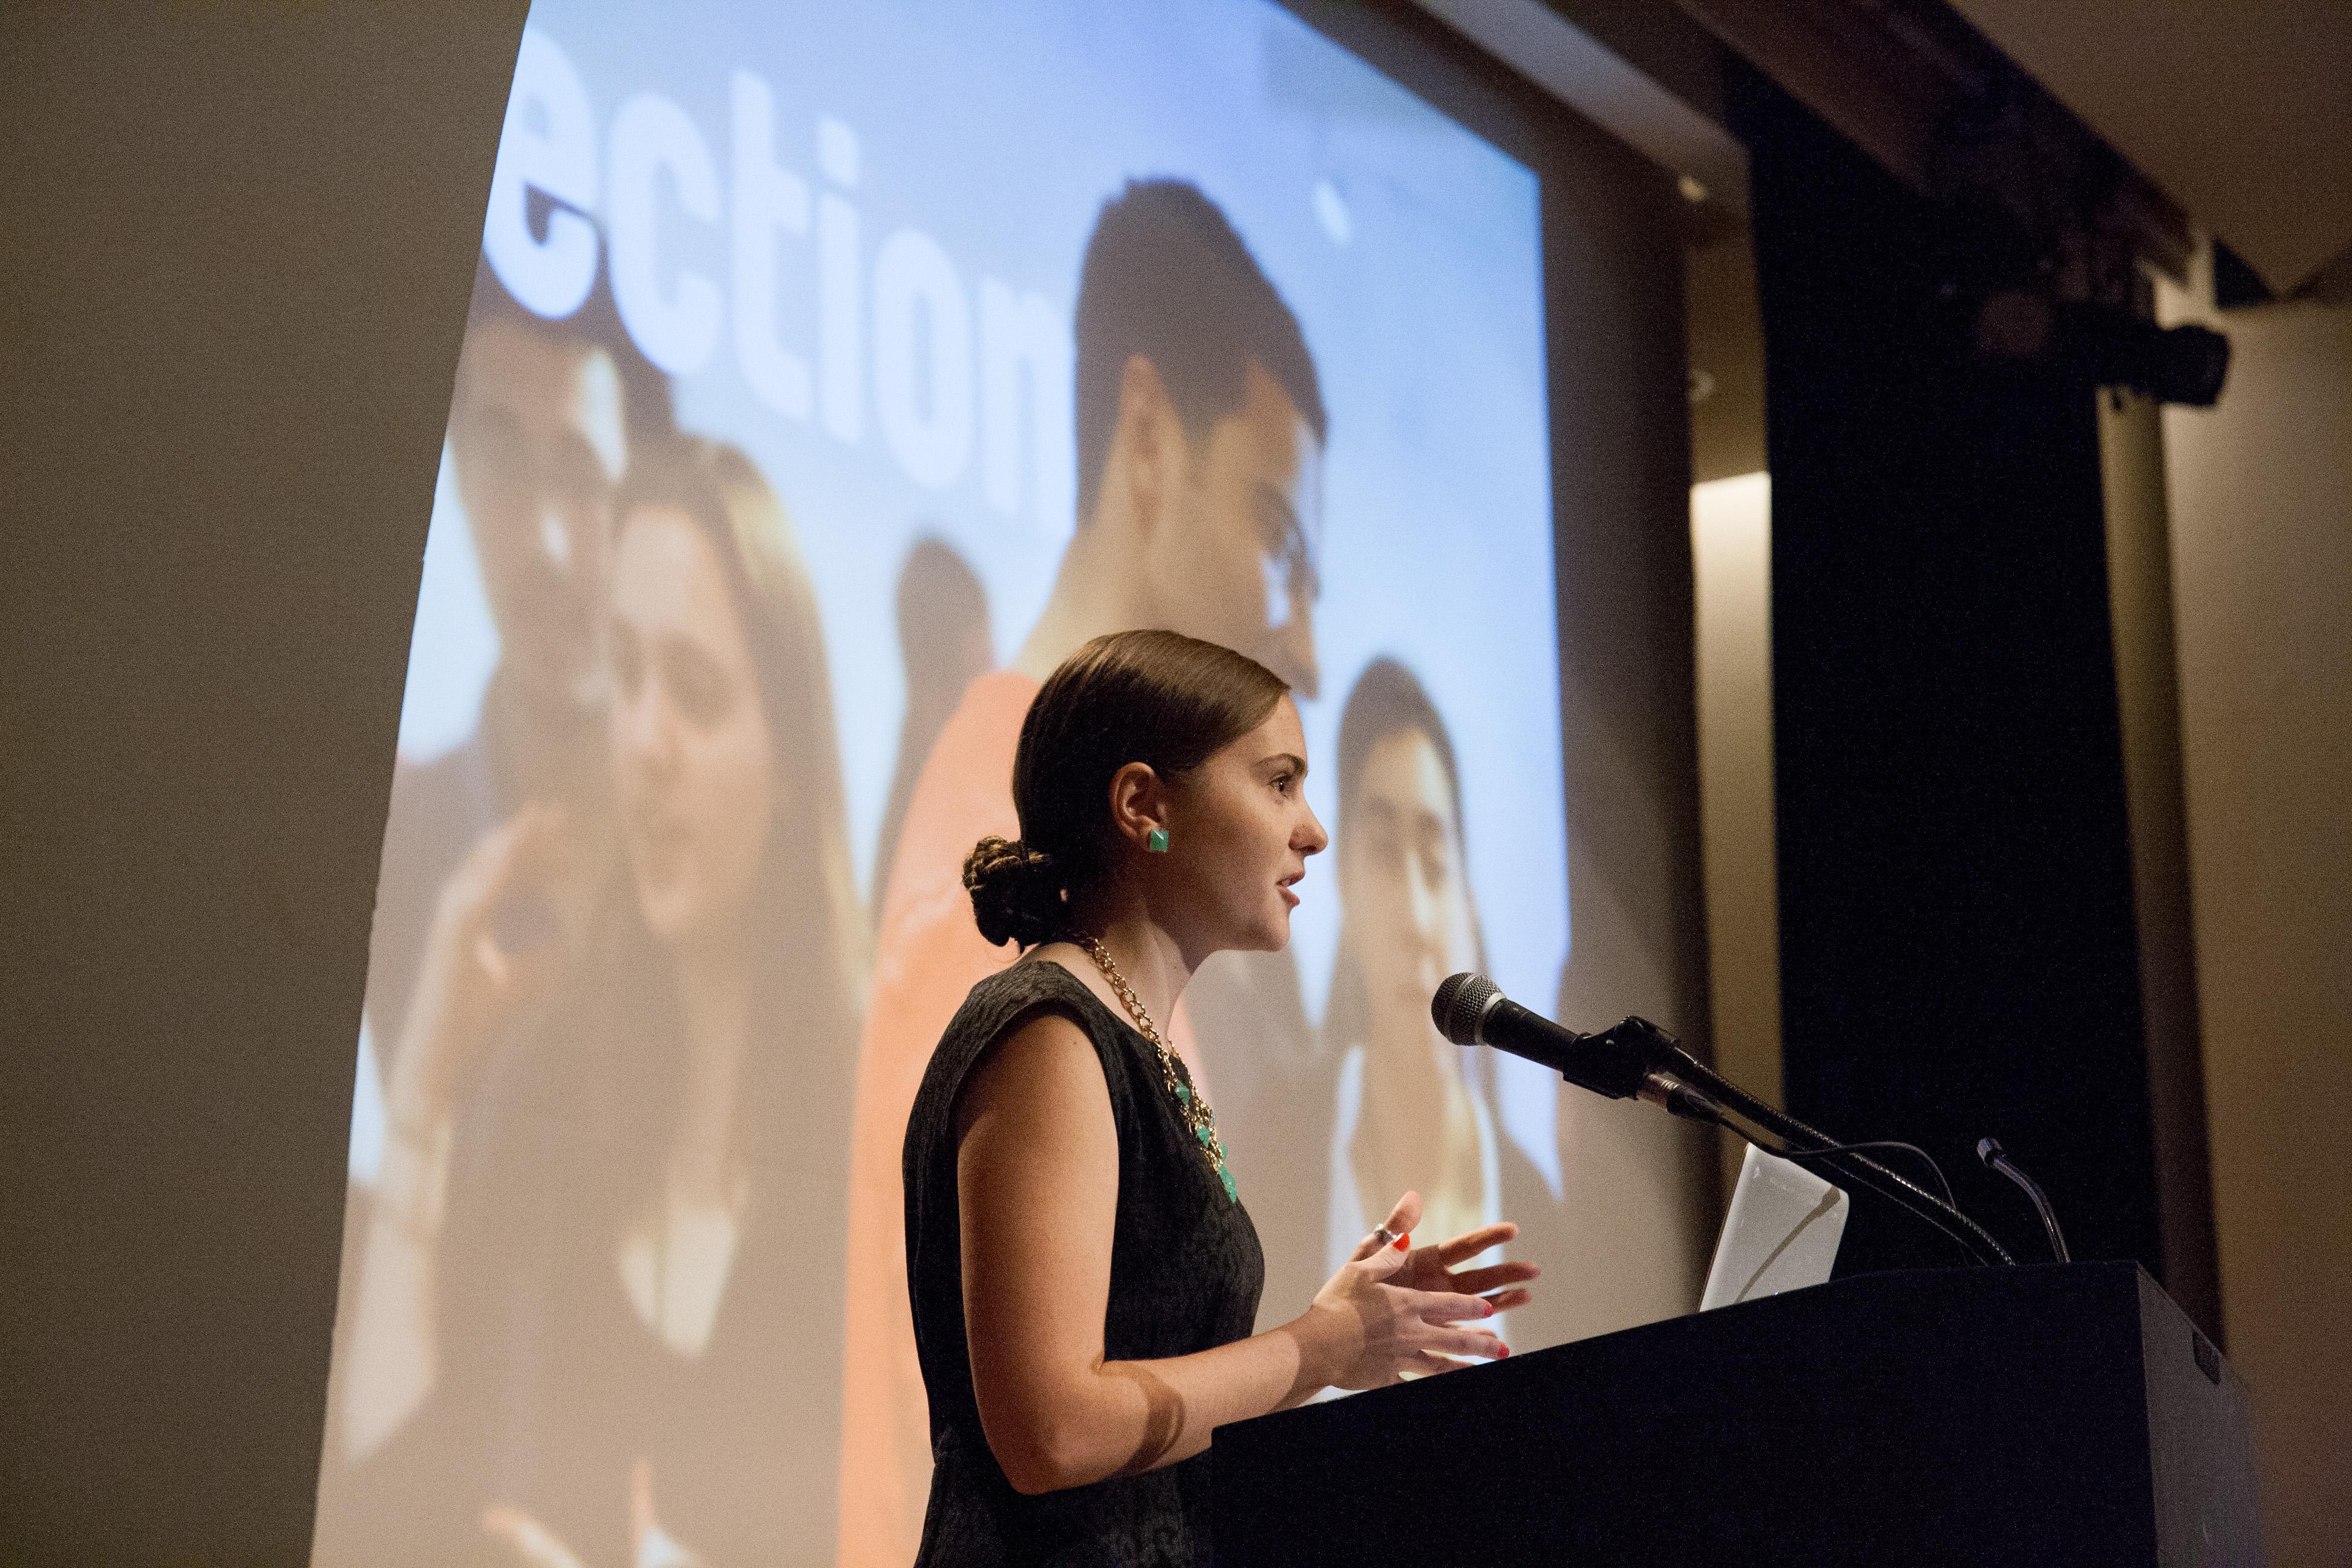 Emily Miethner Gen Z Career Expert